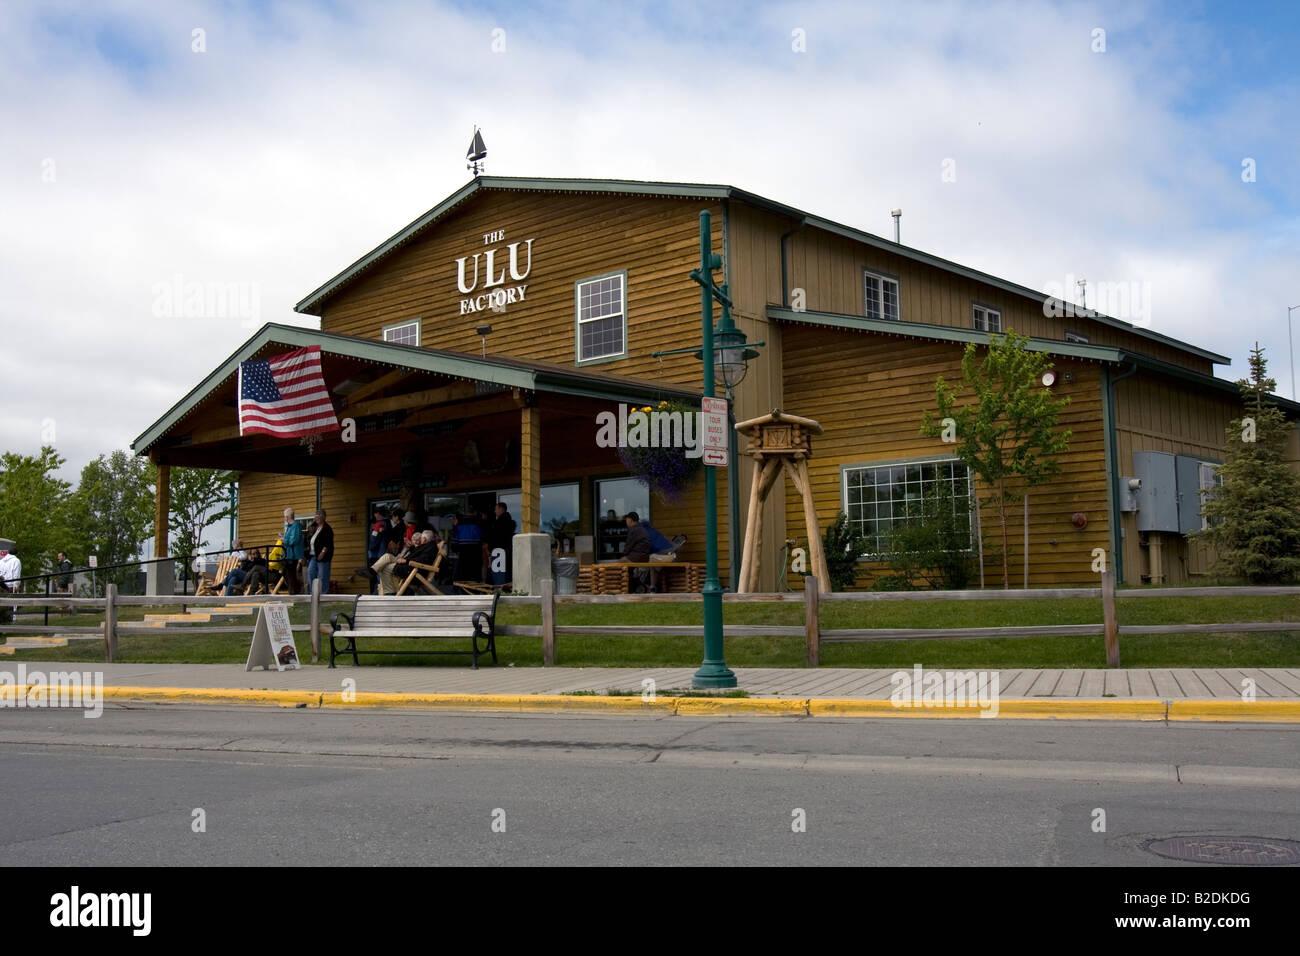 ULU factory Anchorage, Alaska. Stock Photo